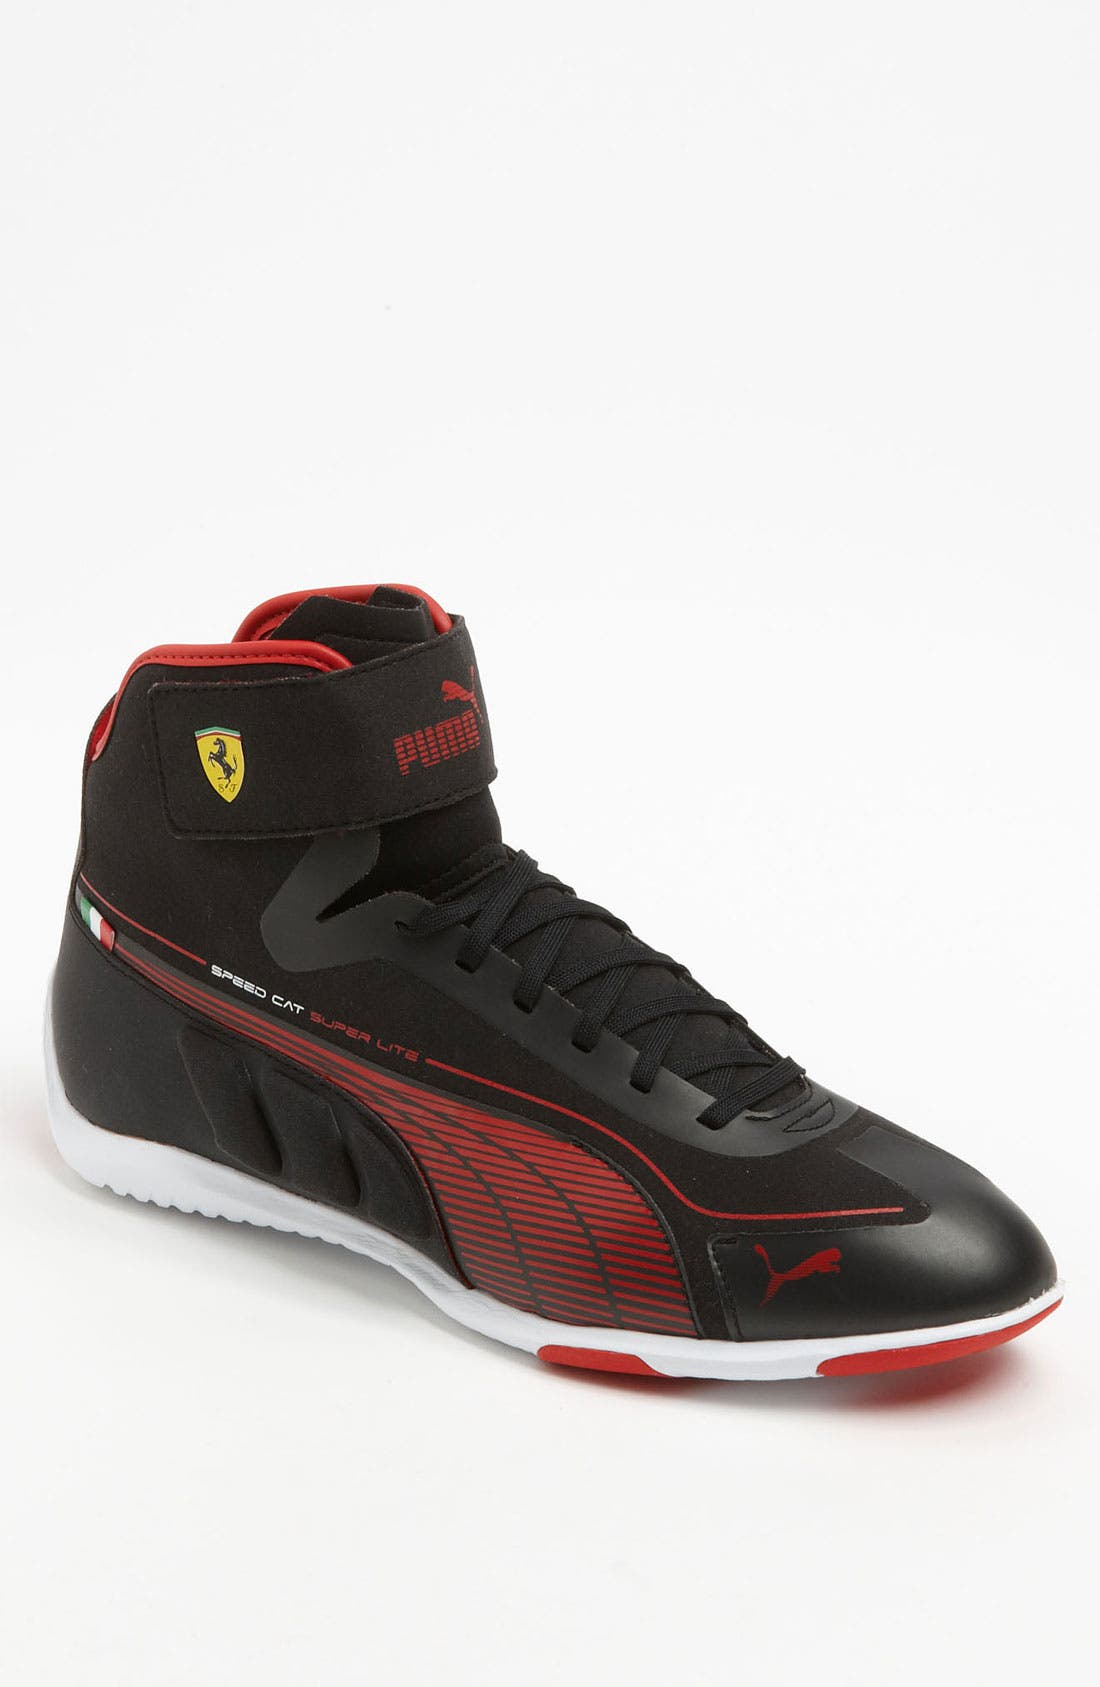 Main Image - PUMA 'Speed Cat SuperLT Mid' Sneaker (Men)